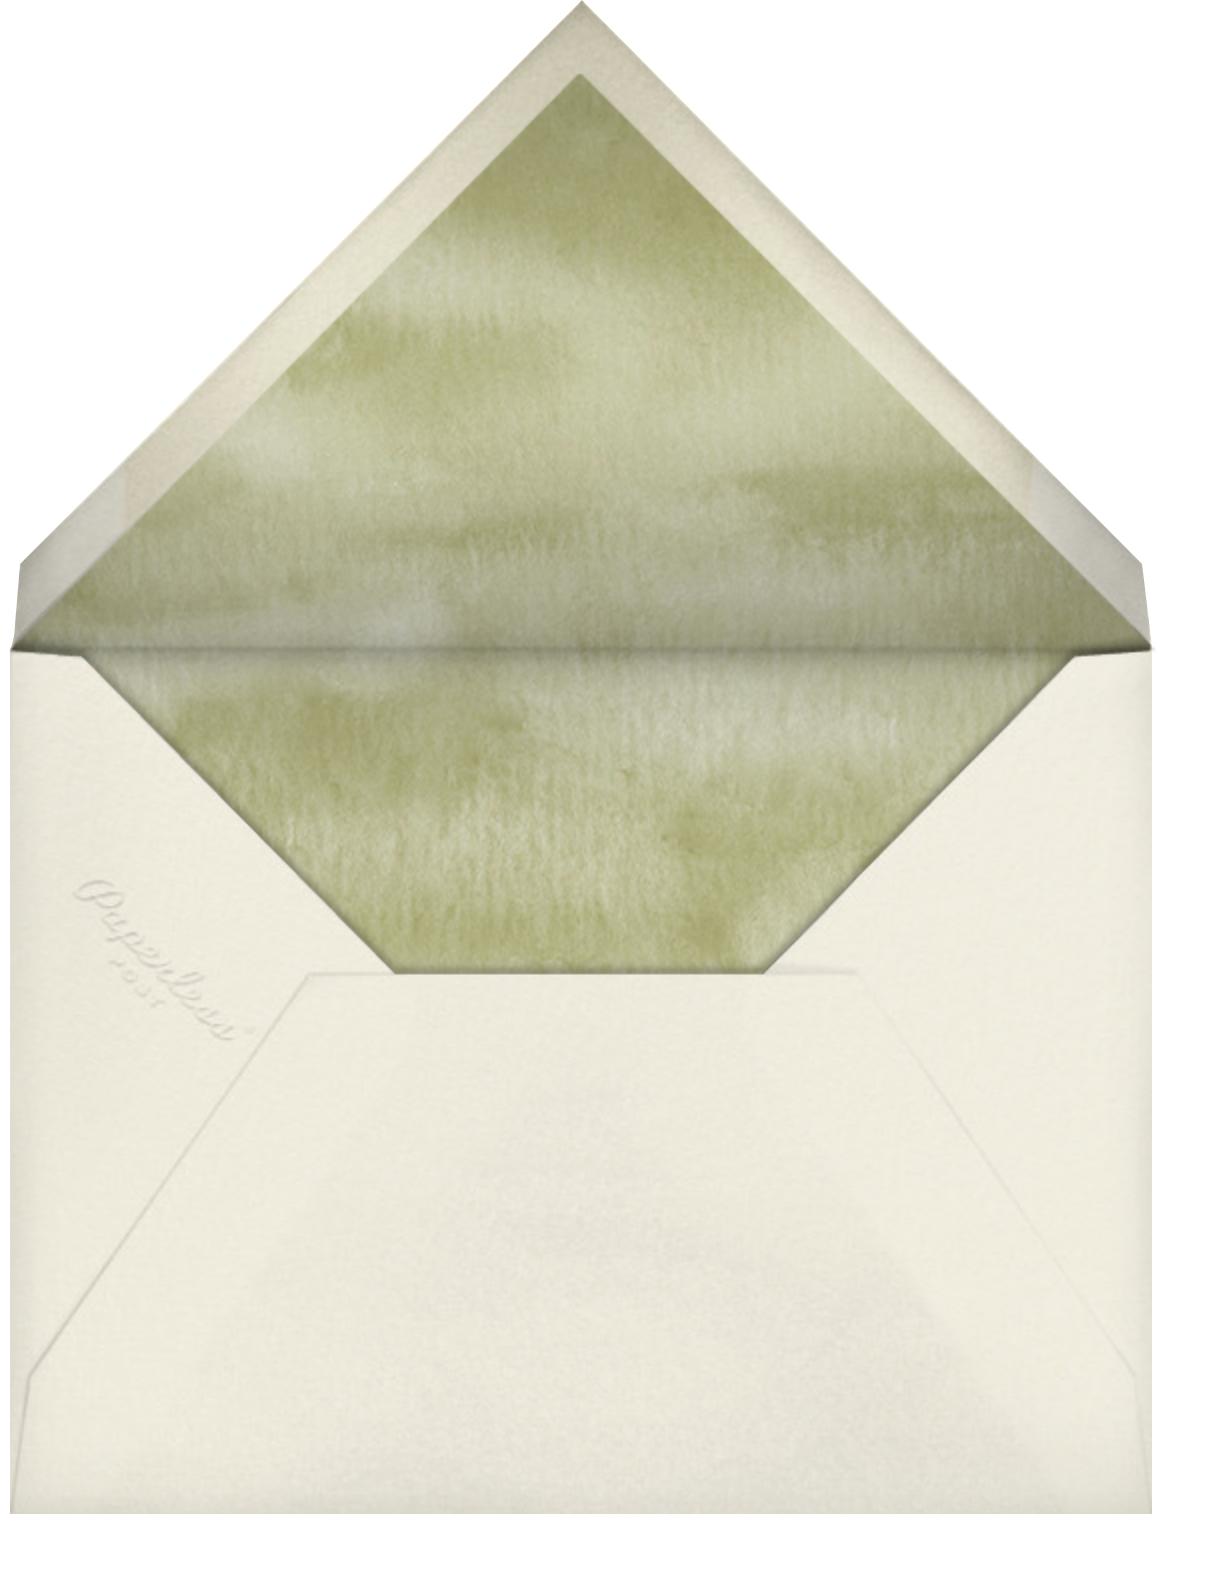 Twining Proposal - Felix Doolittle - Save the date - envelope back